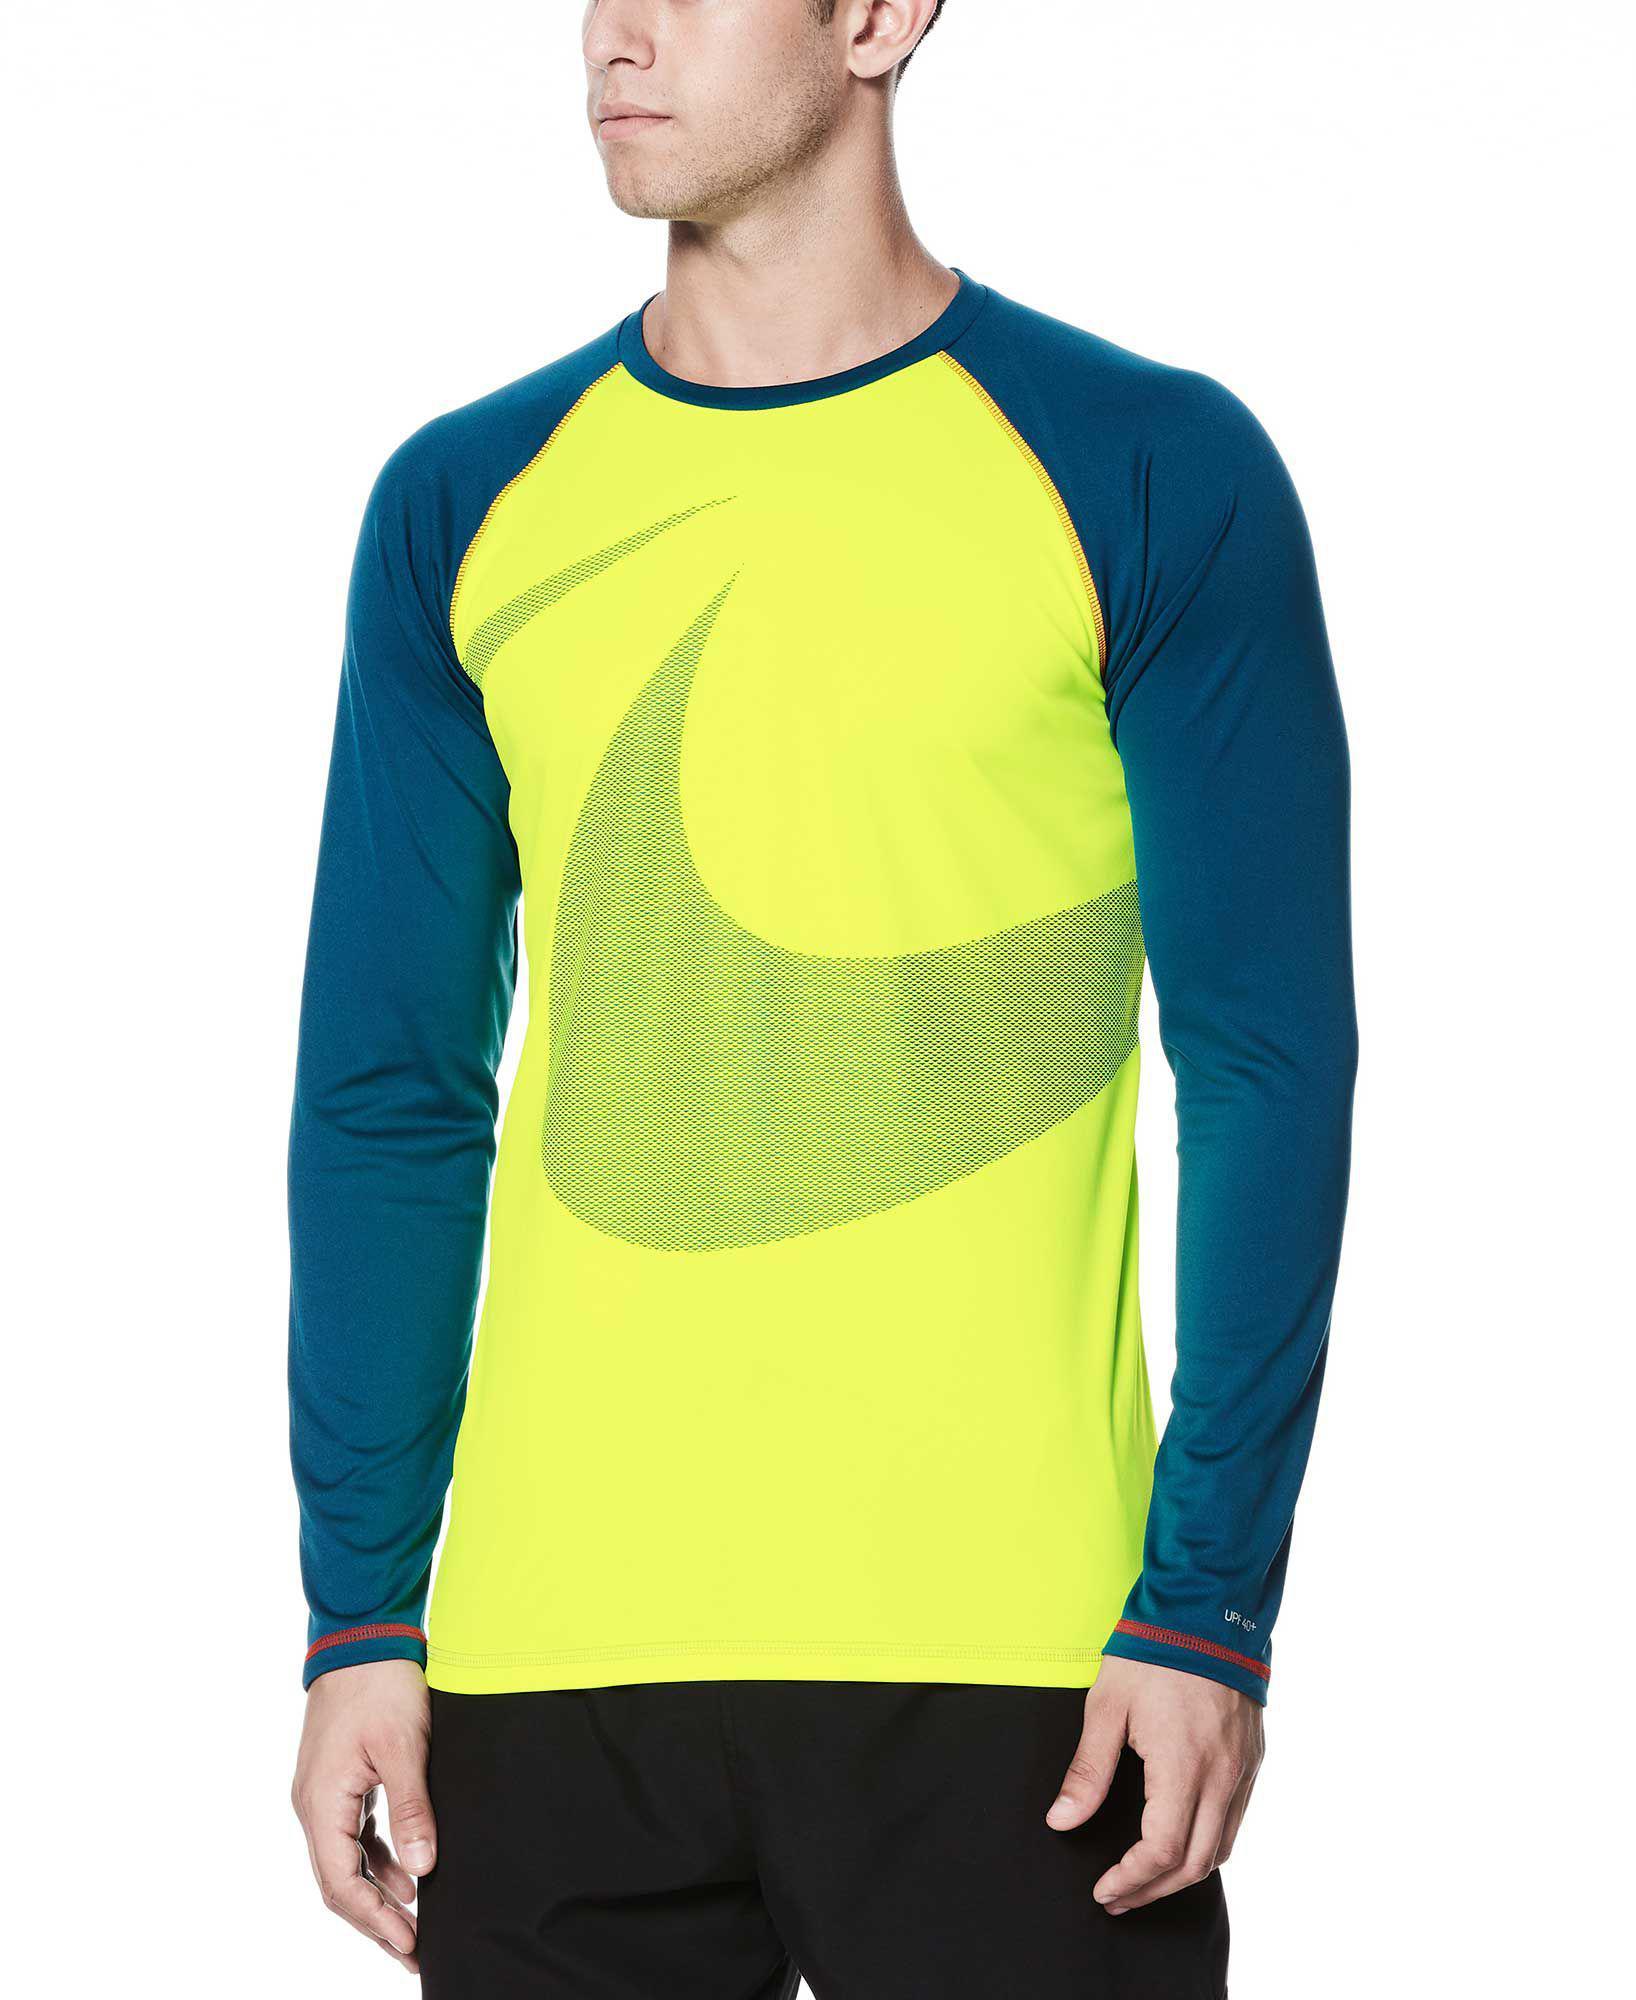 655de3ac Nike Macro Swoosh Long Sleeve Hydro Rash Guard in Yellow for Men - Lyst